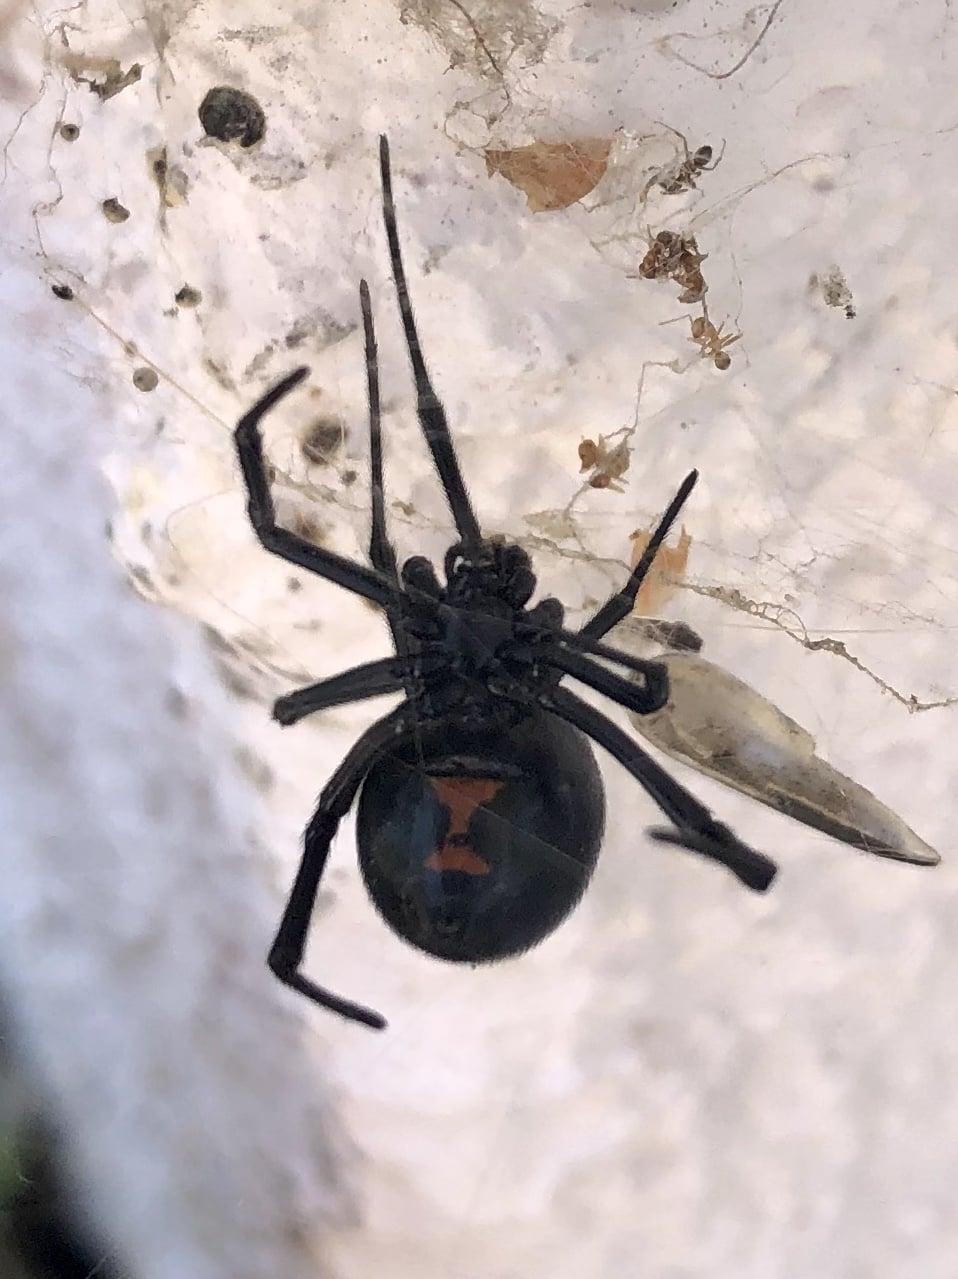 Picture of Latrodectus hesperus (Western Black Widow) - Ventral